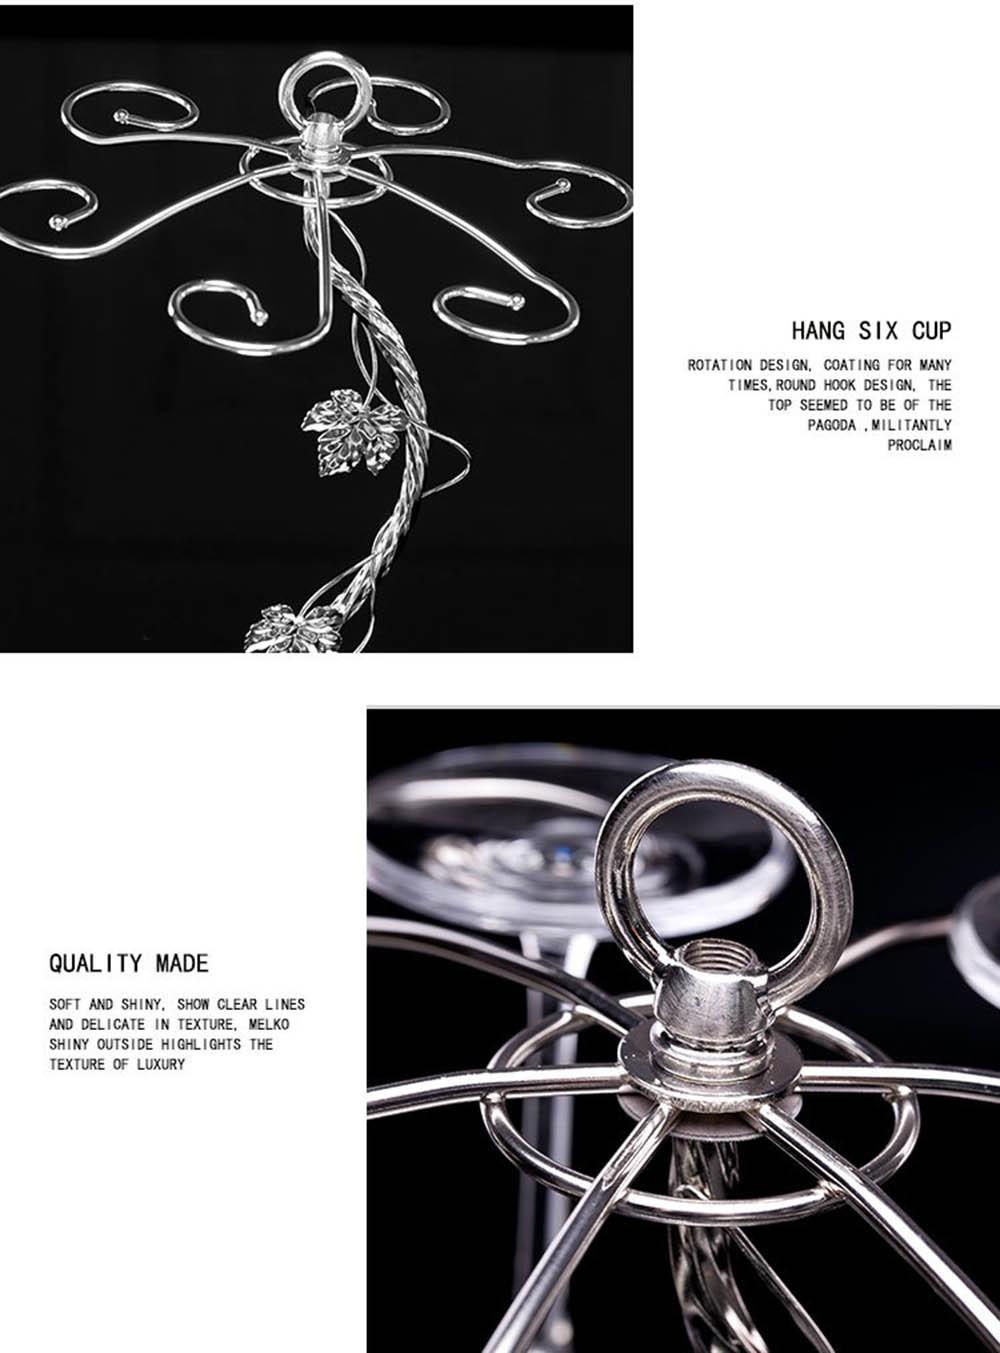 Fashion Decorative Metal Modern Hanging Wine Glass Racks Wine Cabinet Wedding Decor Gift Wine Glass Holder Wine Accessories KC1284 (6)